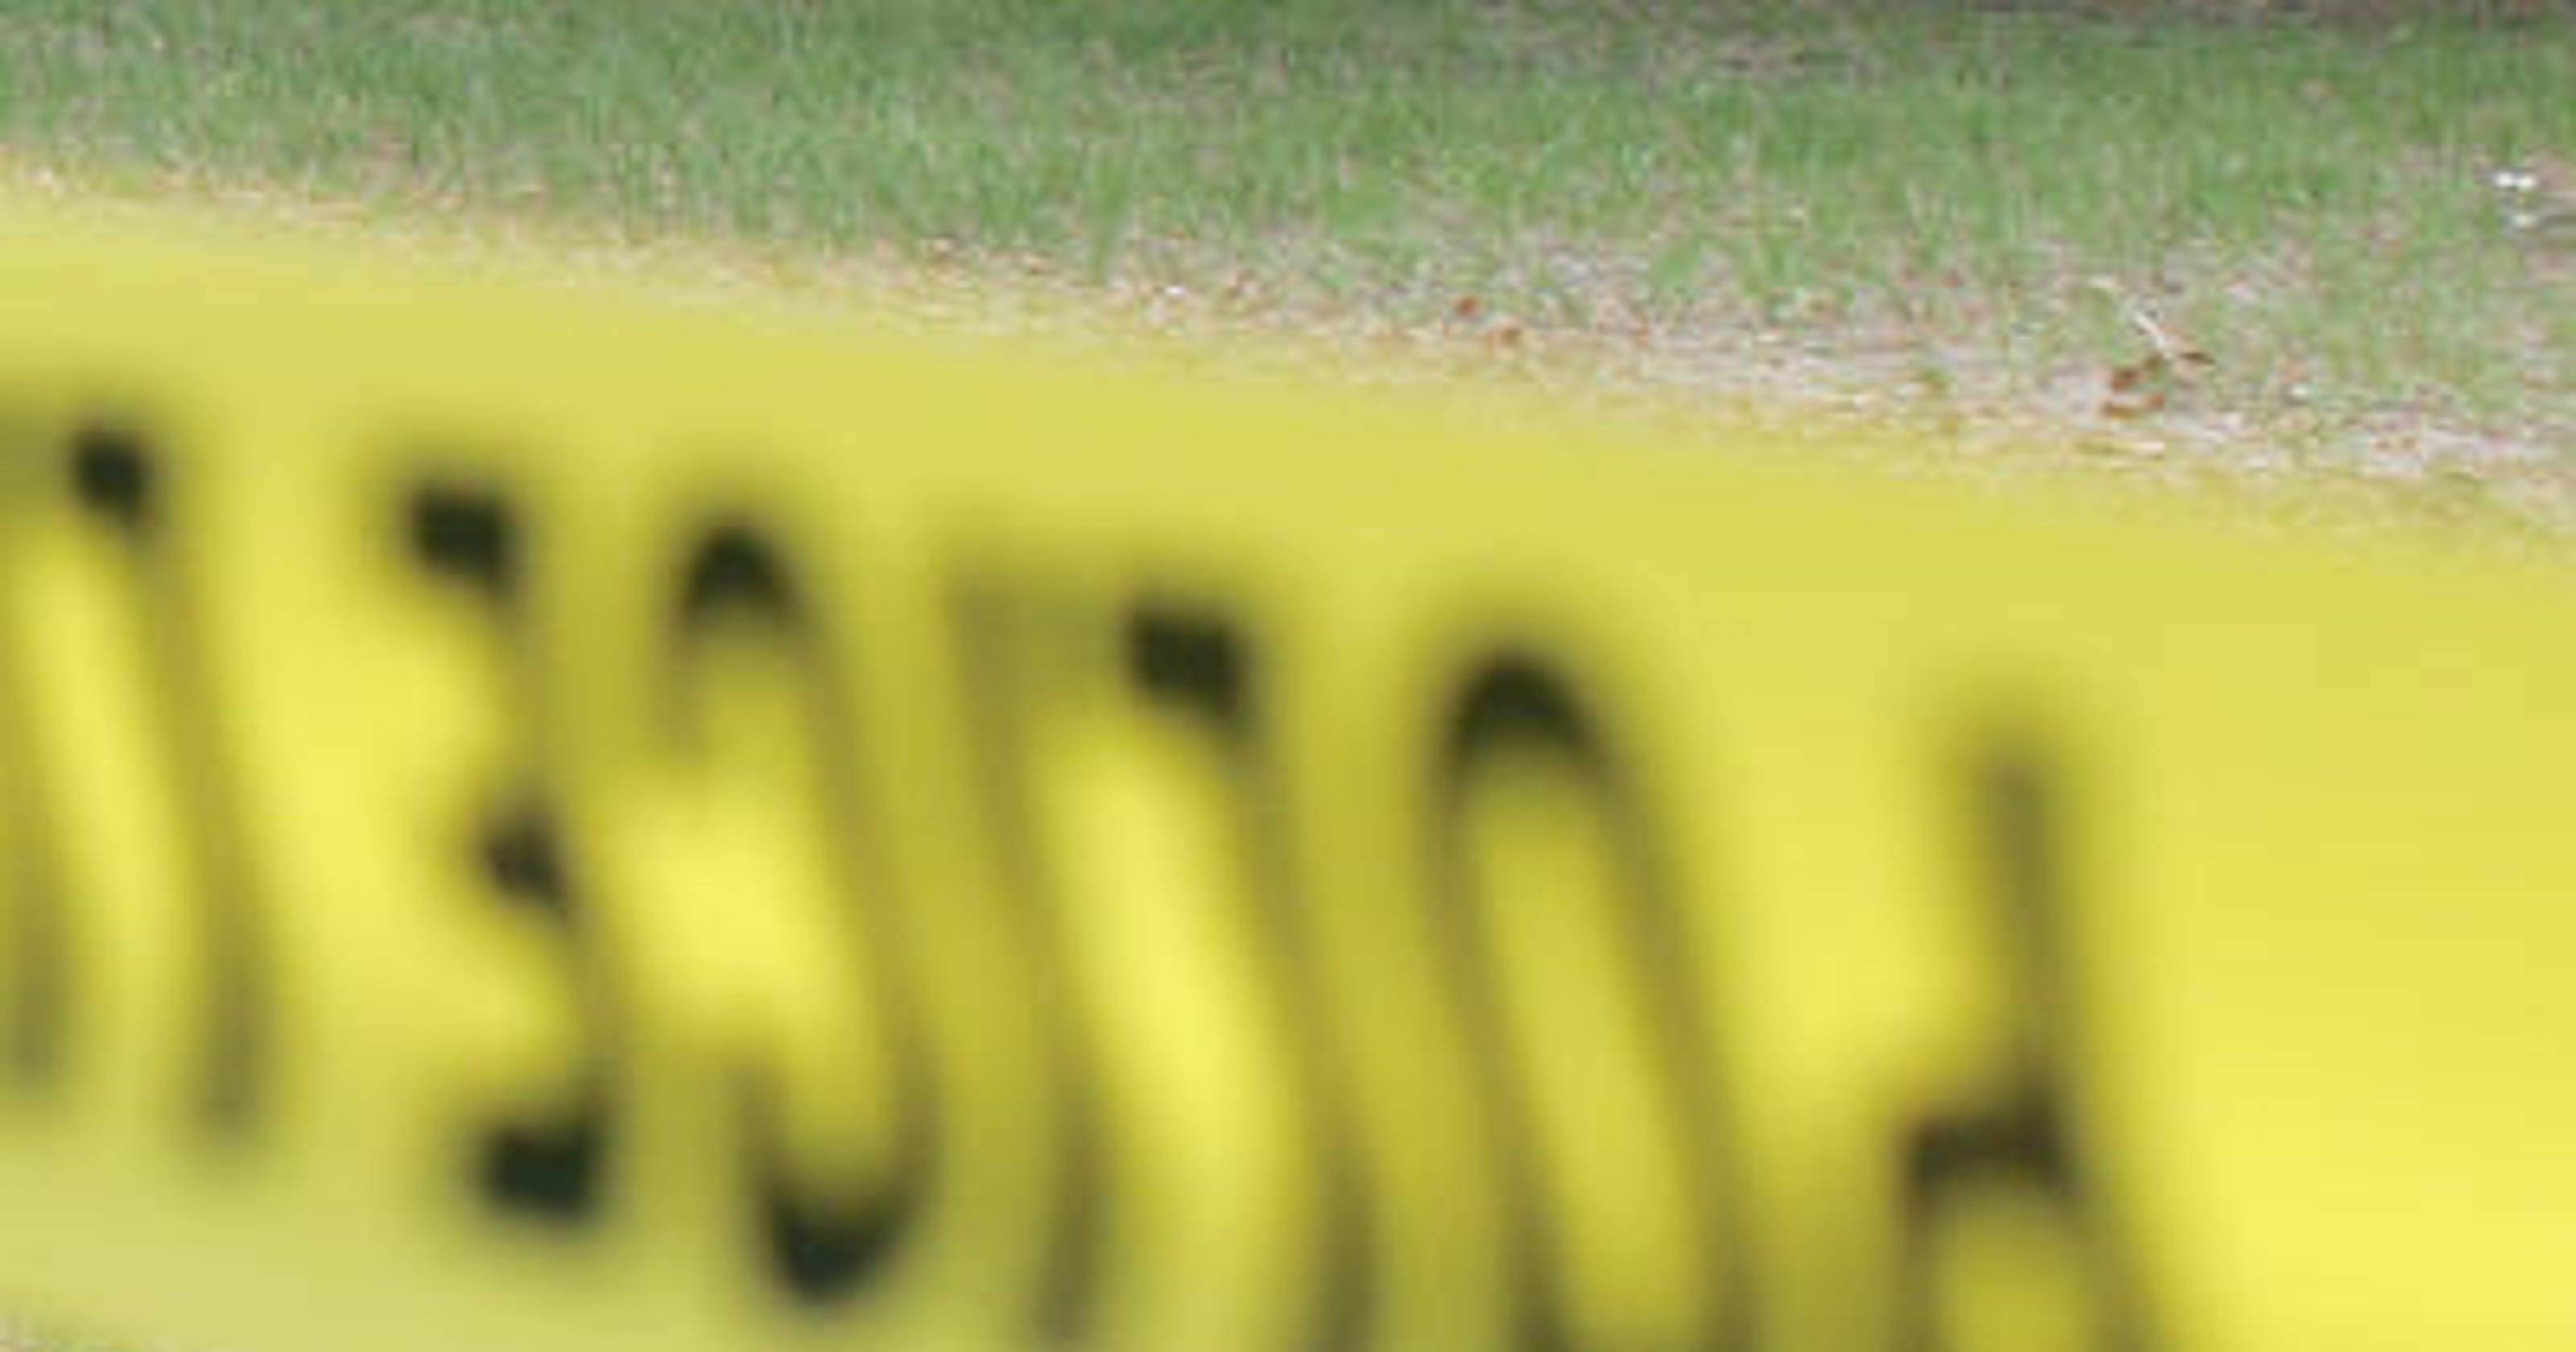 Motorcyclist killed in Franklin crash